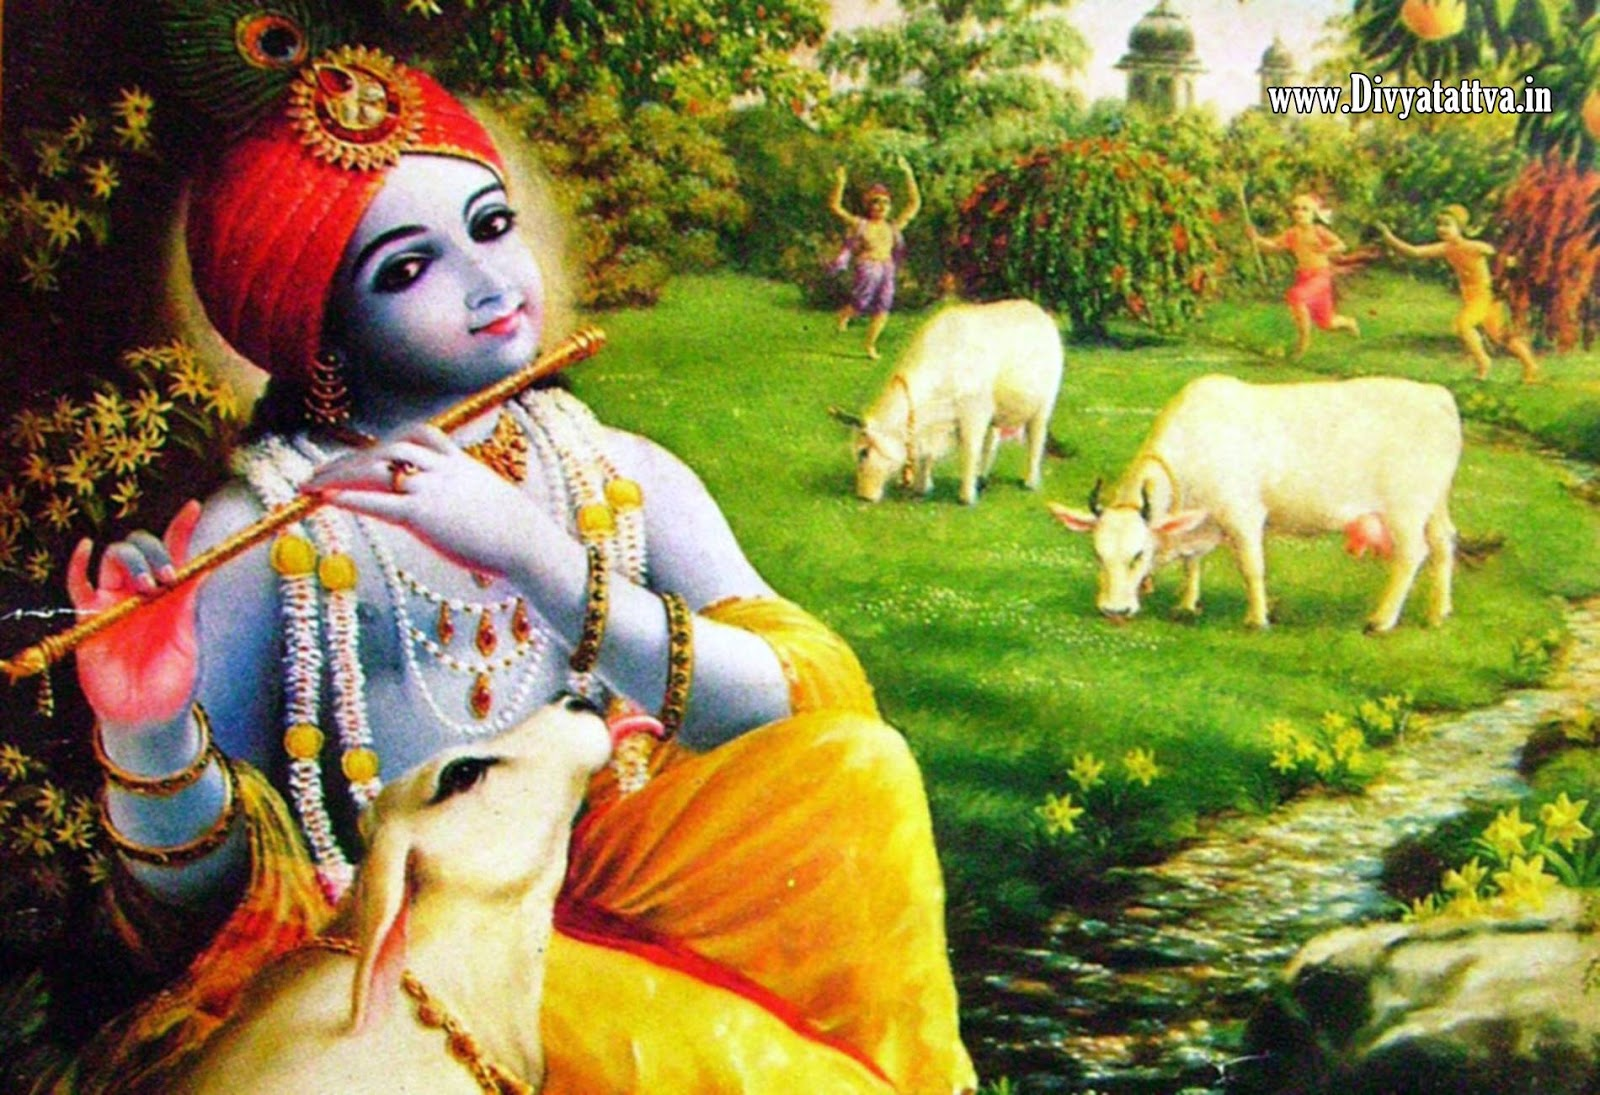 krishna gwala radha god hindu spiritual hinduism cow mathura vrindavan www.divyatattva.in